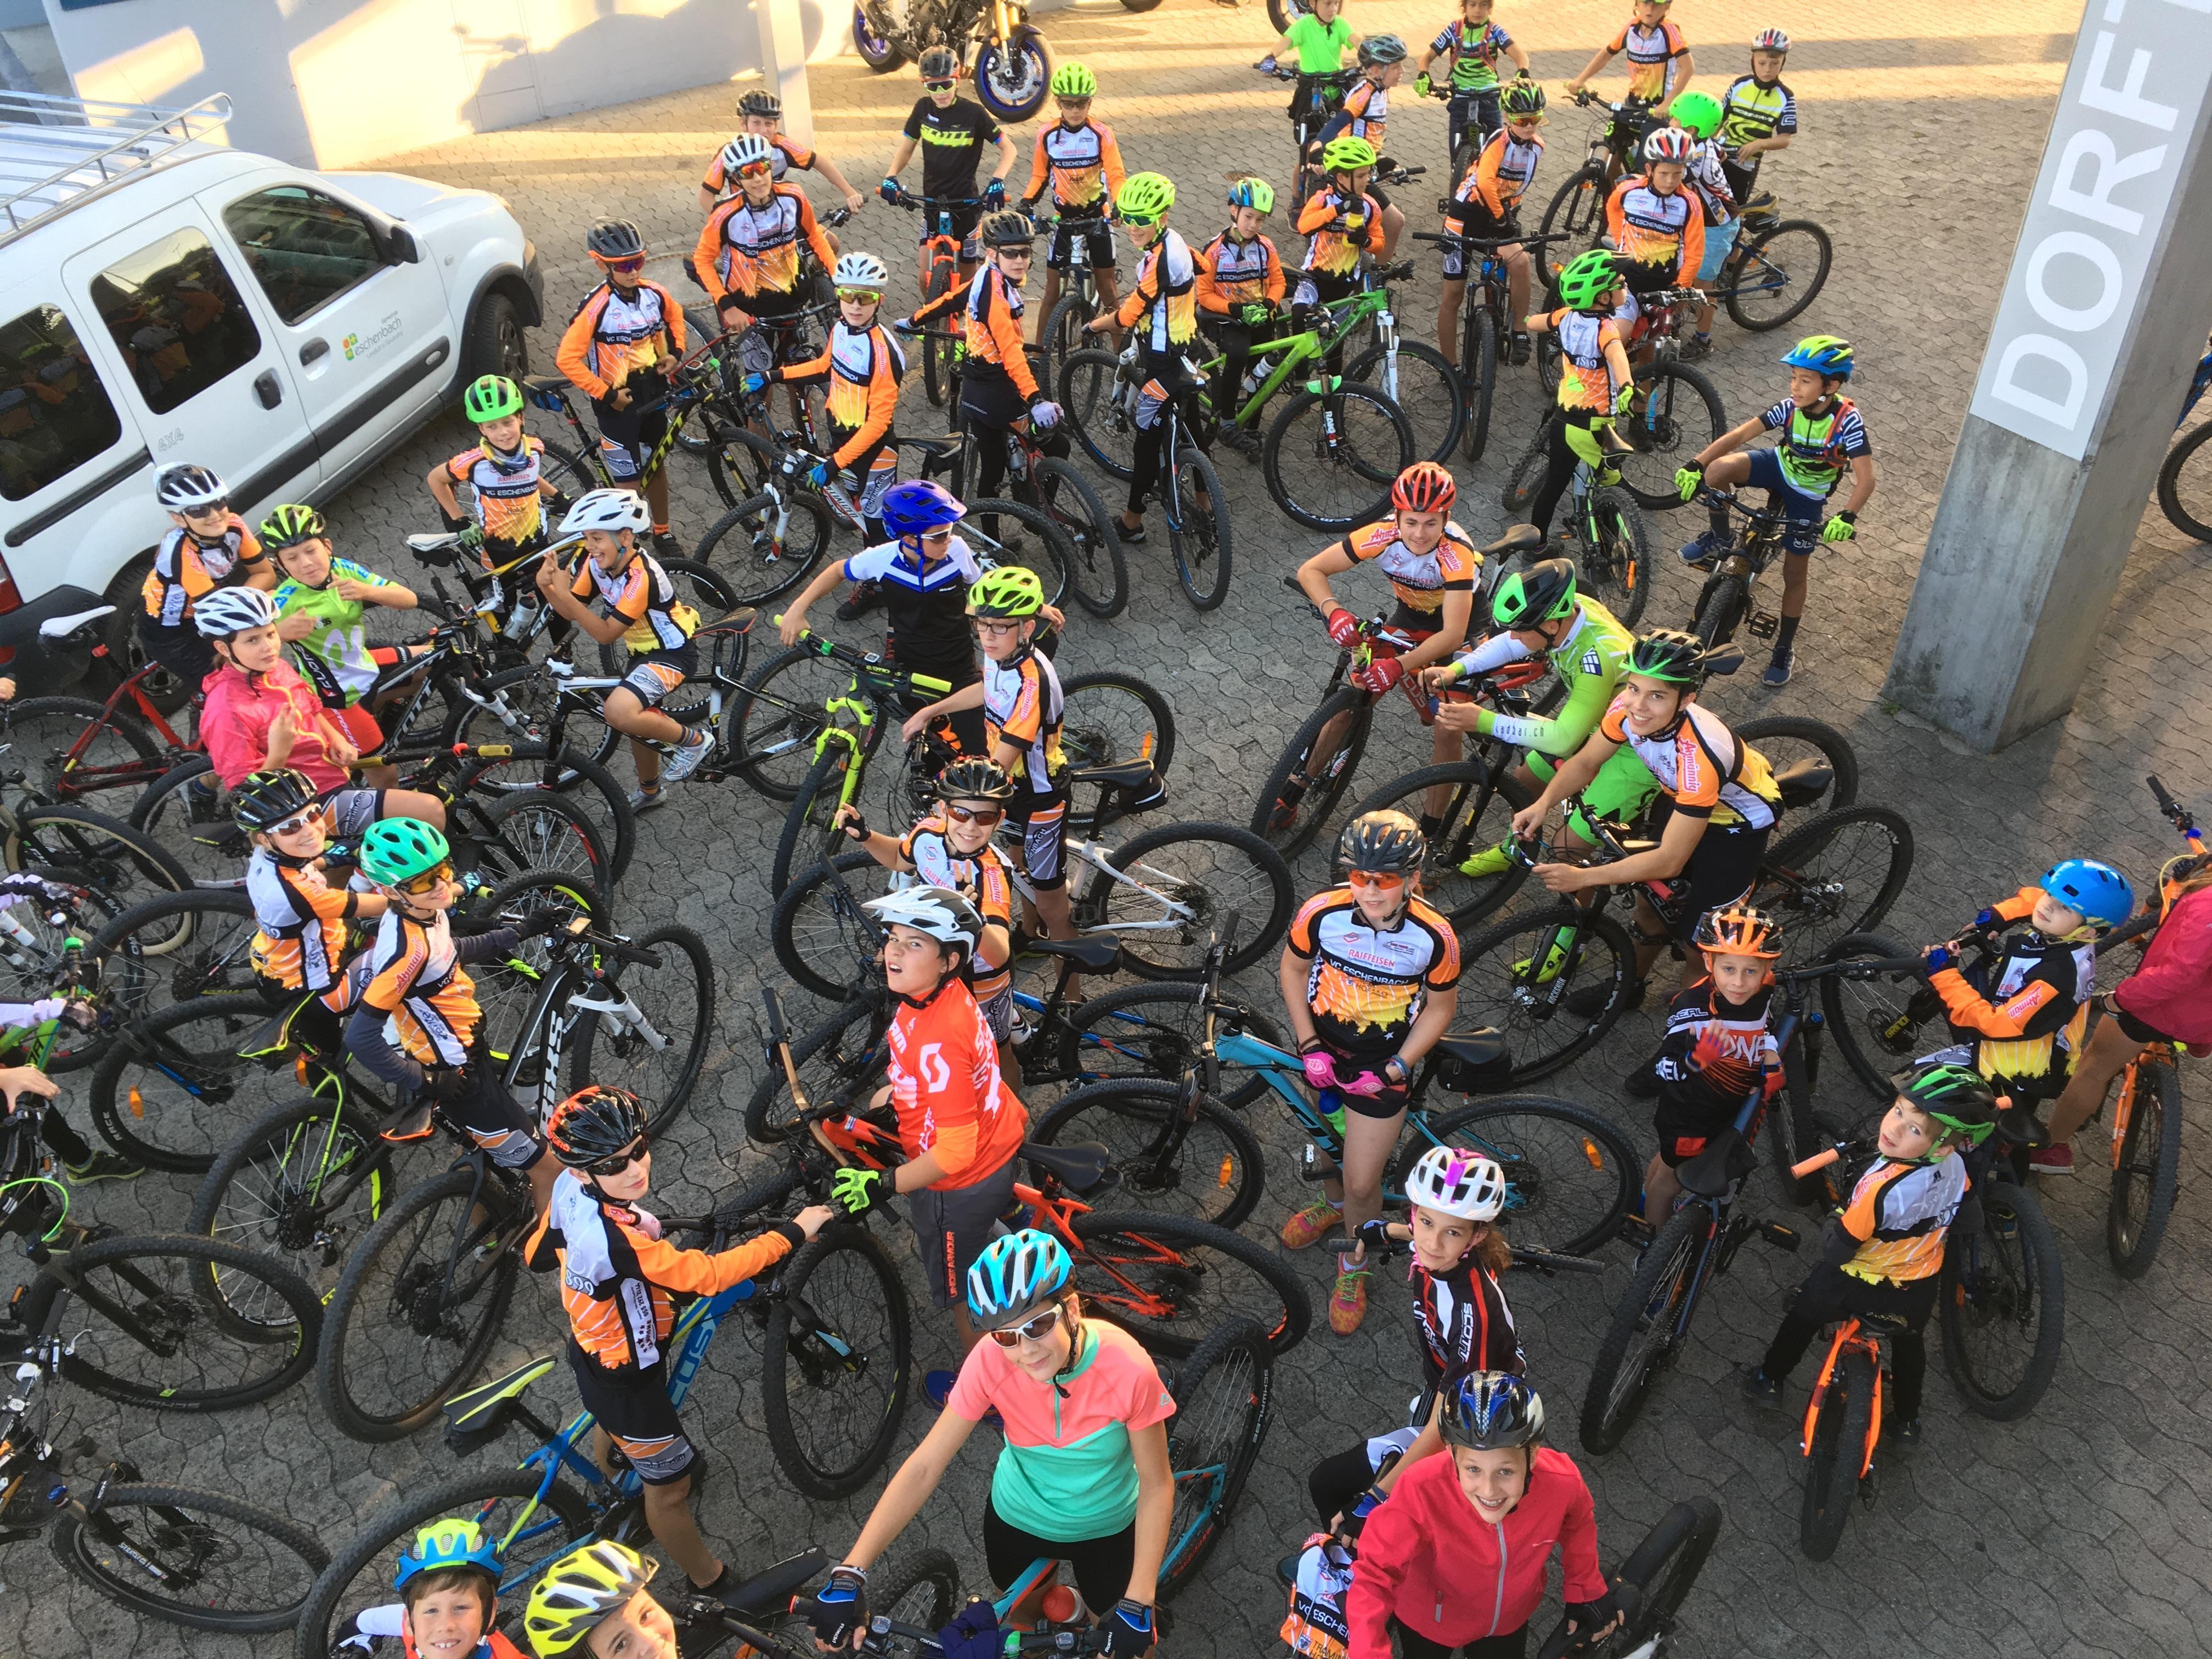 2018.09.27 Kids-Biken Saisonabschluss